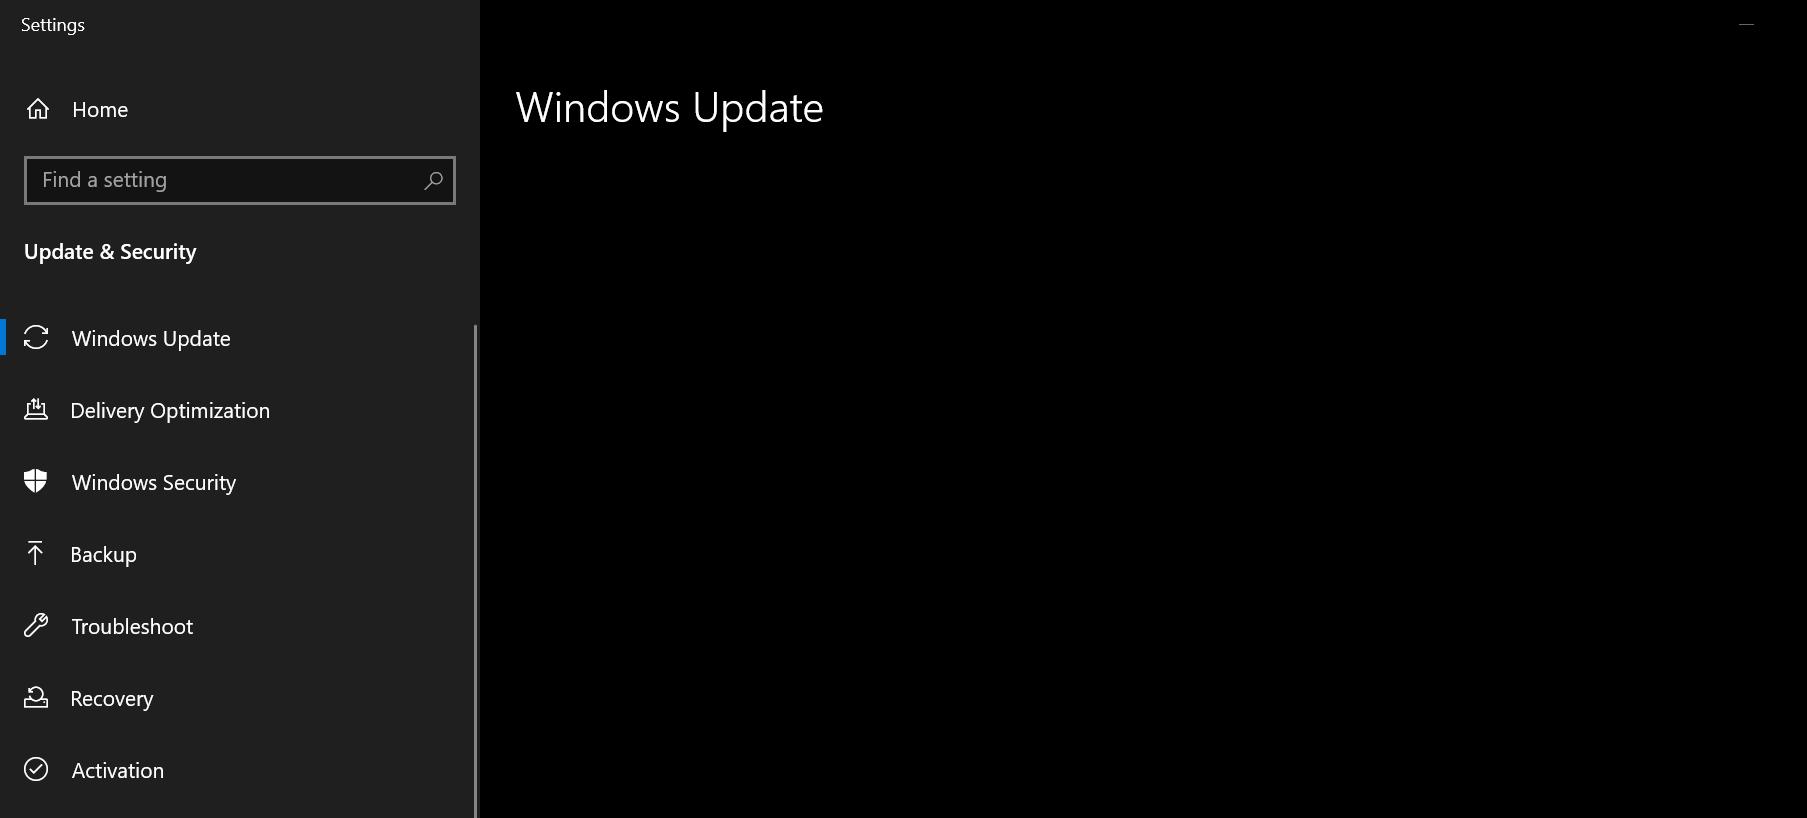 windows update screen not loading f43180bf-21ef-4525-983b-e5c34ff68bec?upload=true.png